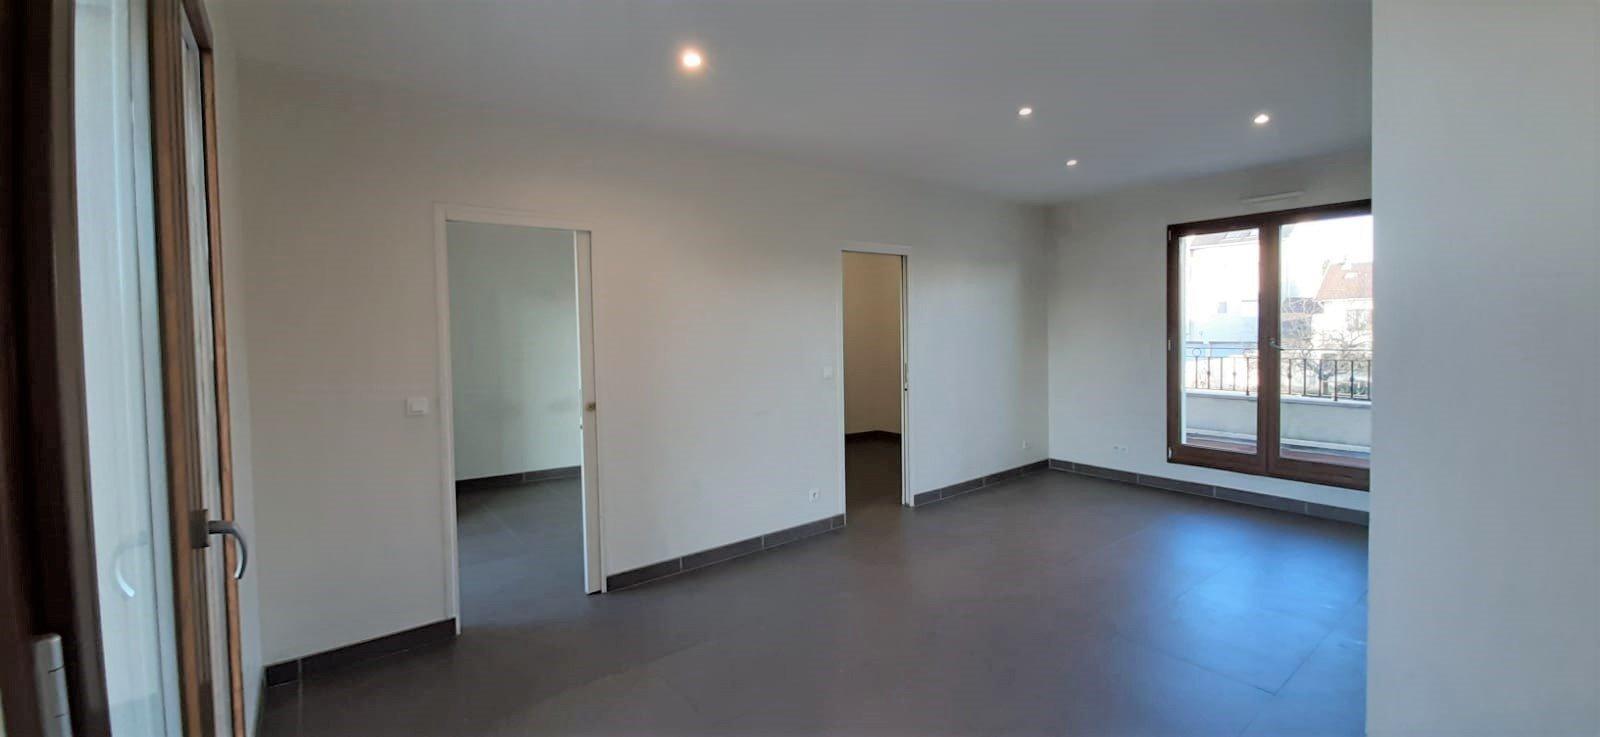 Rental Apartment - Mitry-Mory Mitry-le-Neuf